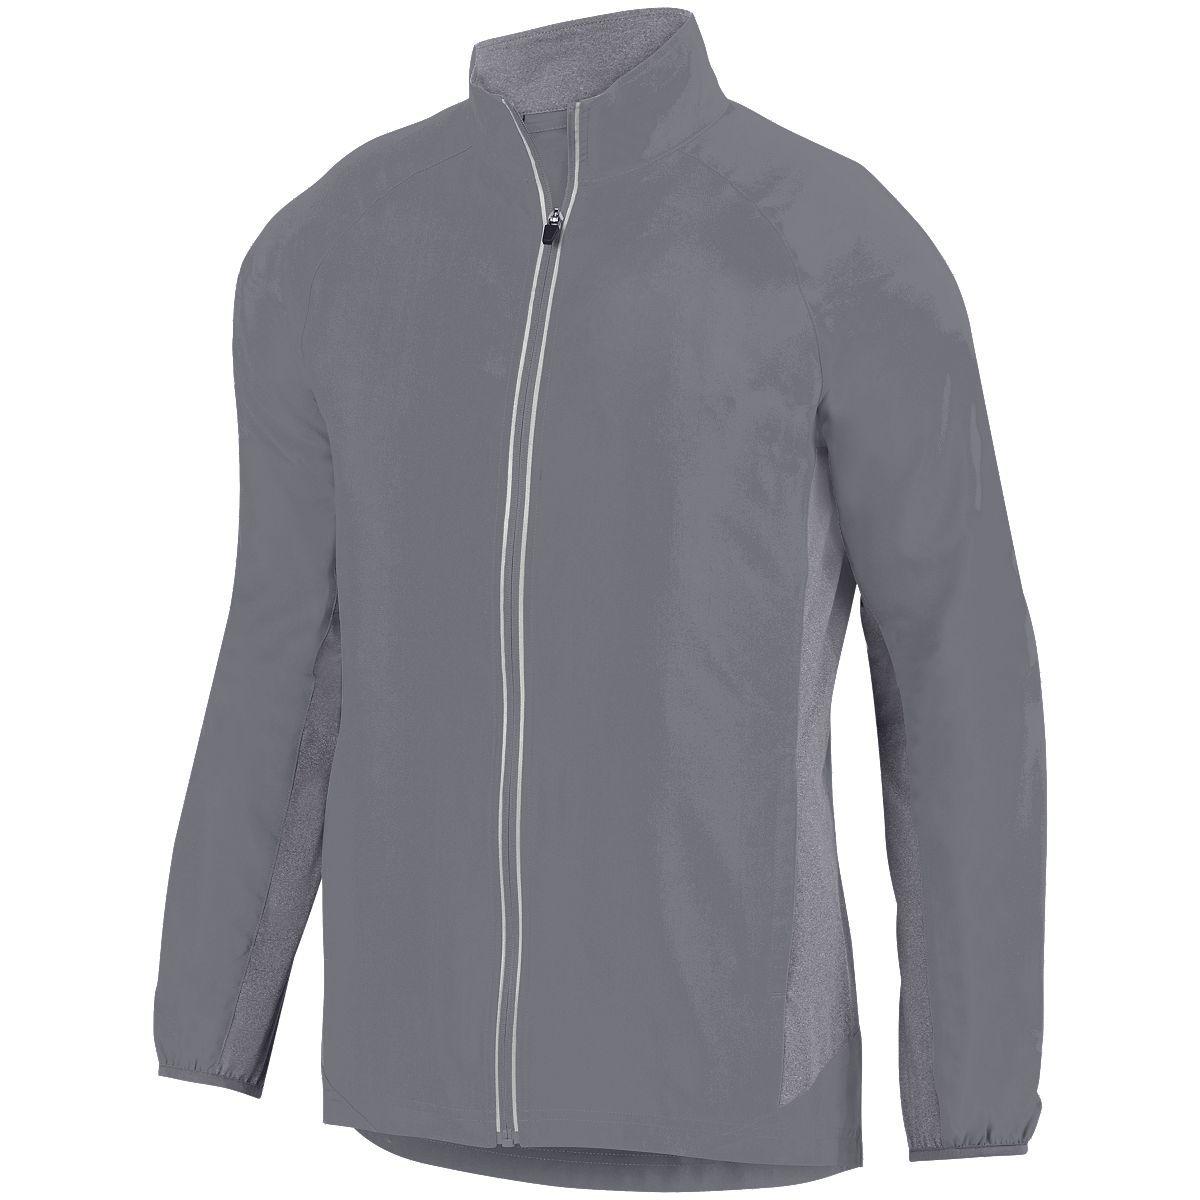 Preeminent Jacket - GRAPHITE/GRAPHITE HEATHER